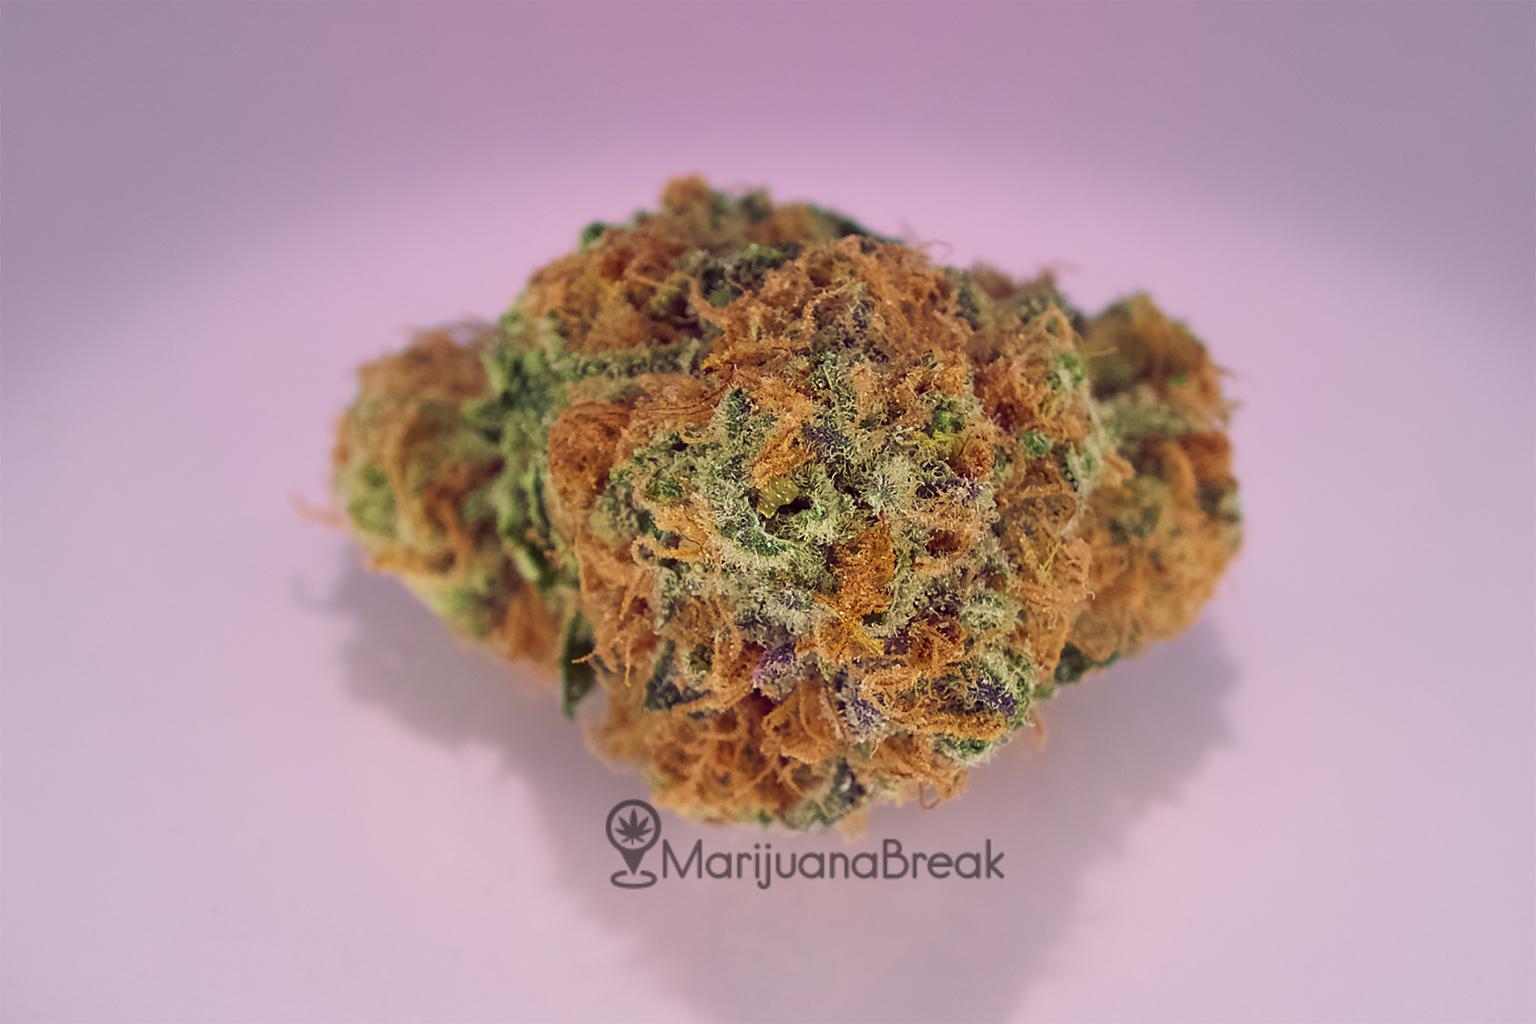 Strawberry Cough Marijuana Strain Review [2019]